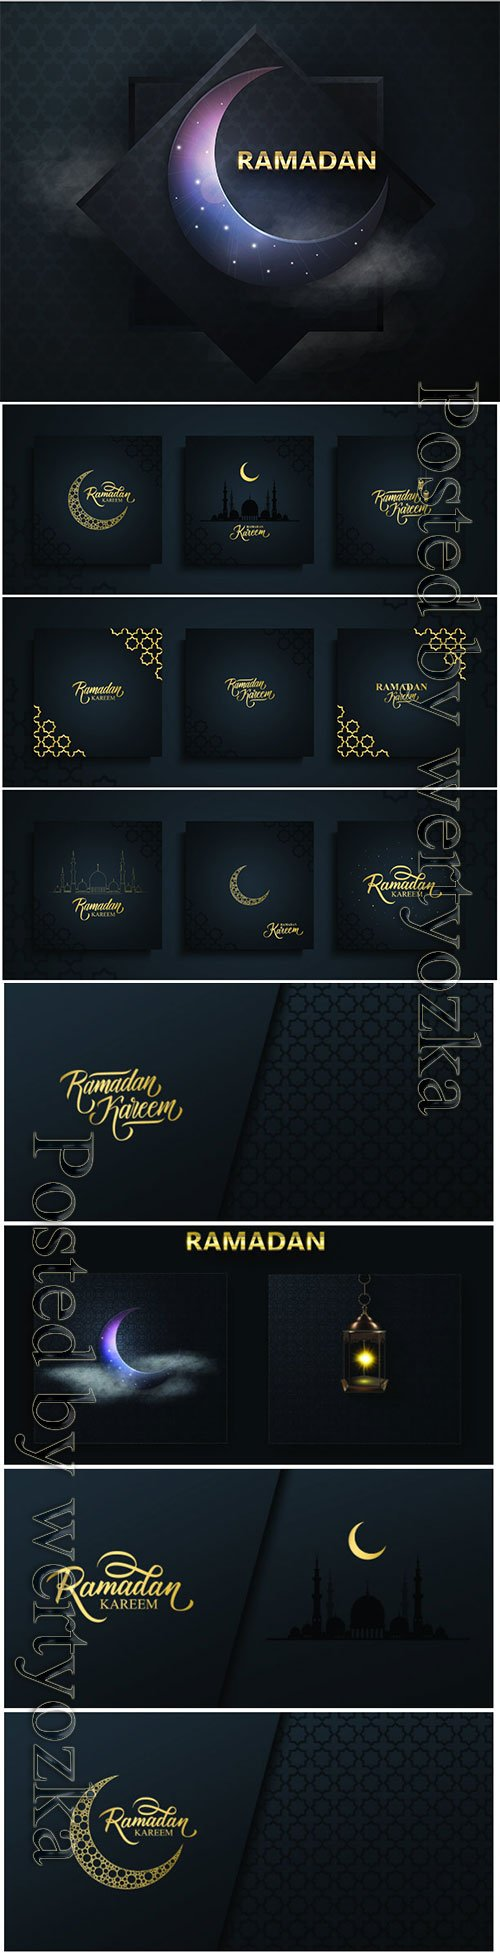 Ramadan Kareem vector background, Eid mubarak greeting card